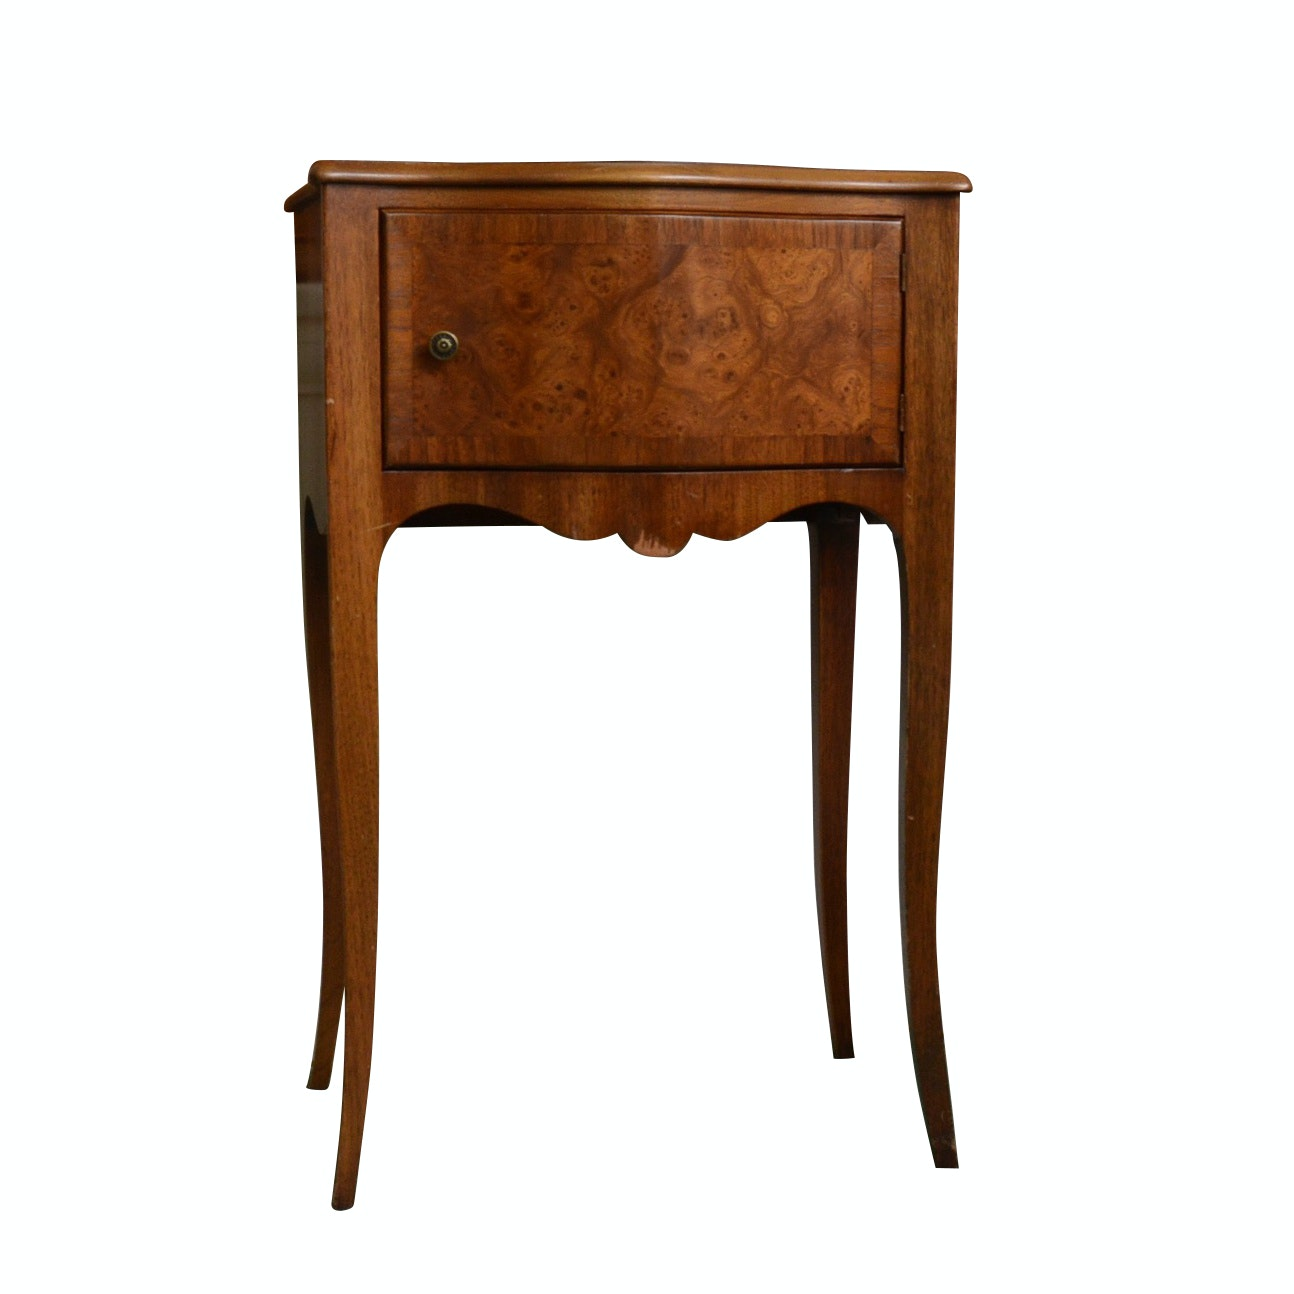 John Widdicomb Louis XV Style Burl Wood and Walnut Bedside Table